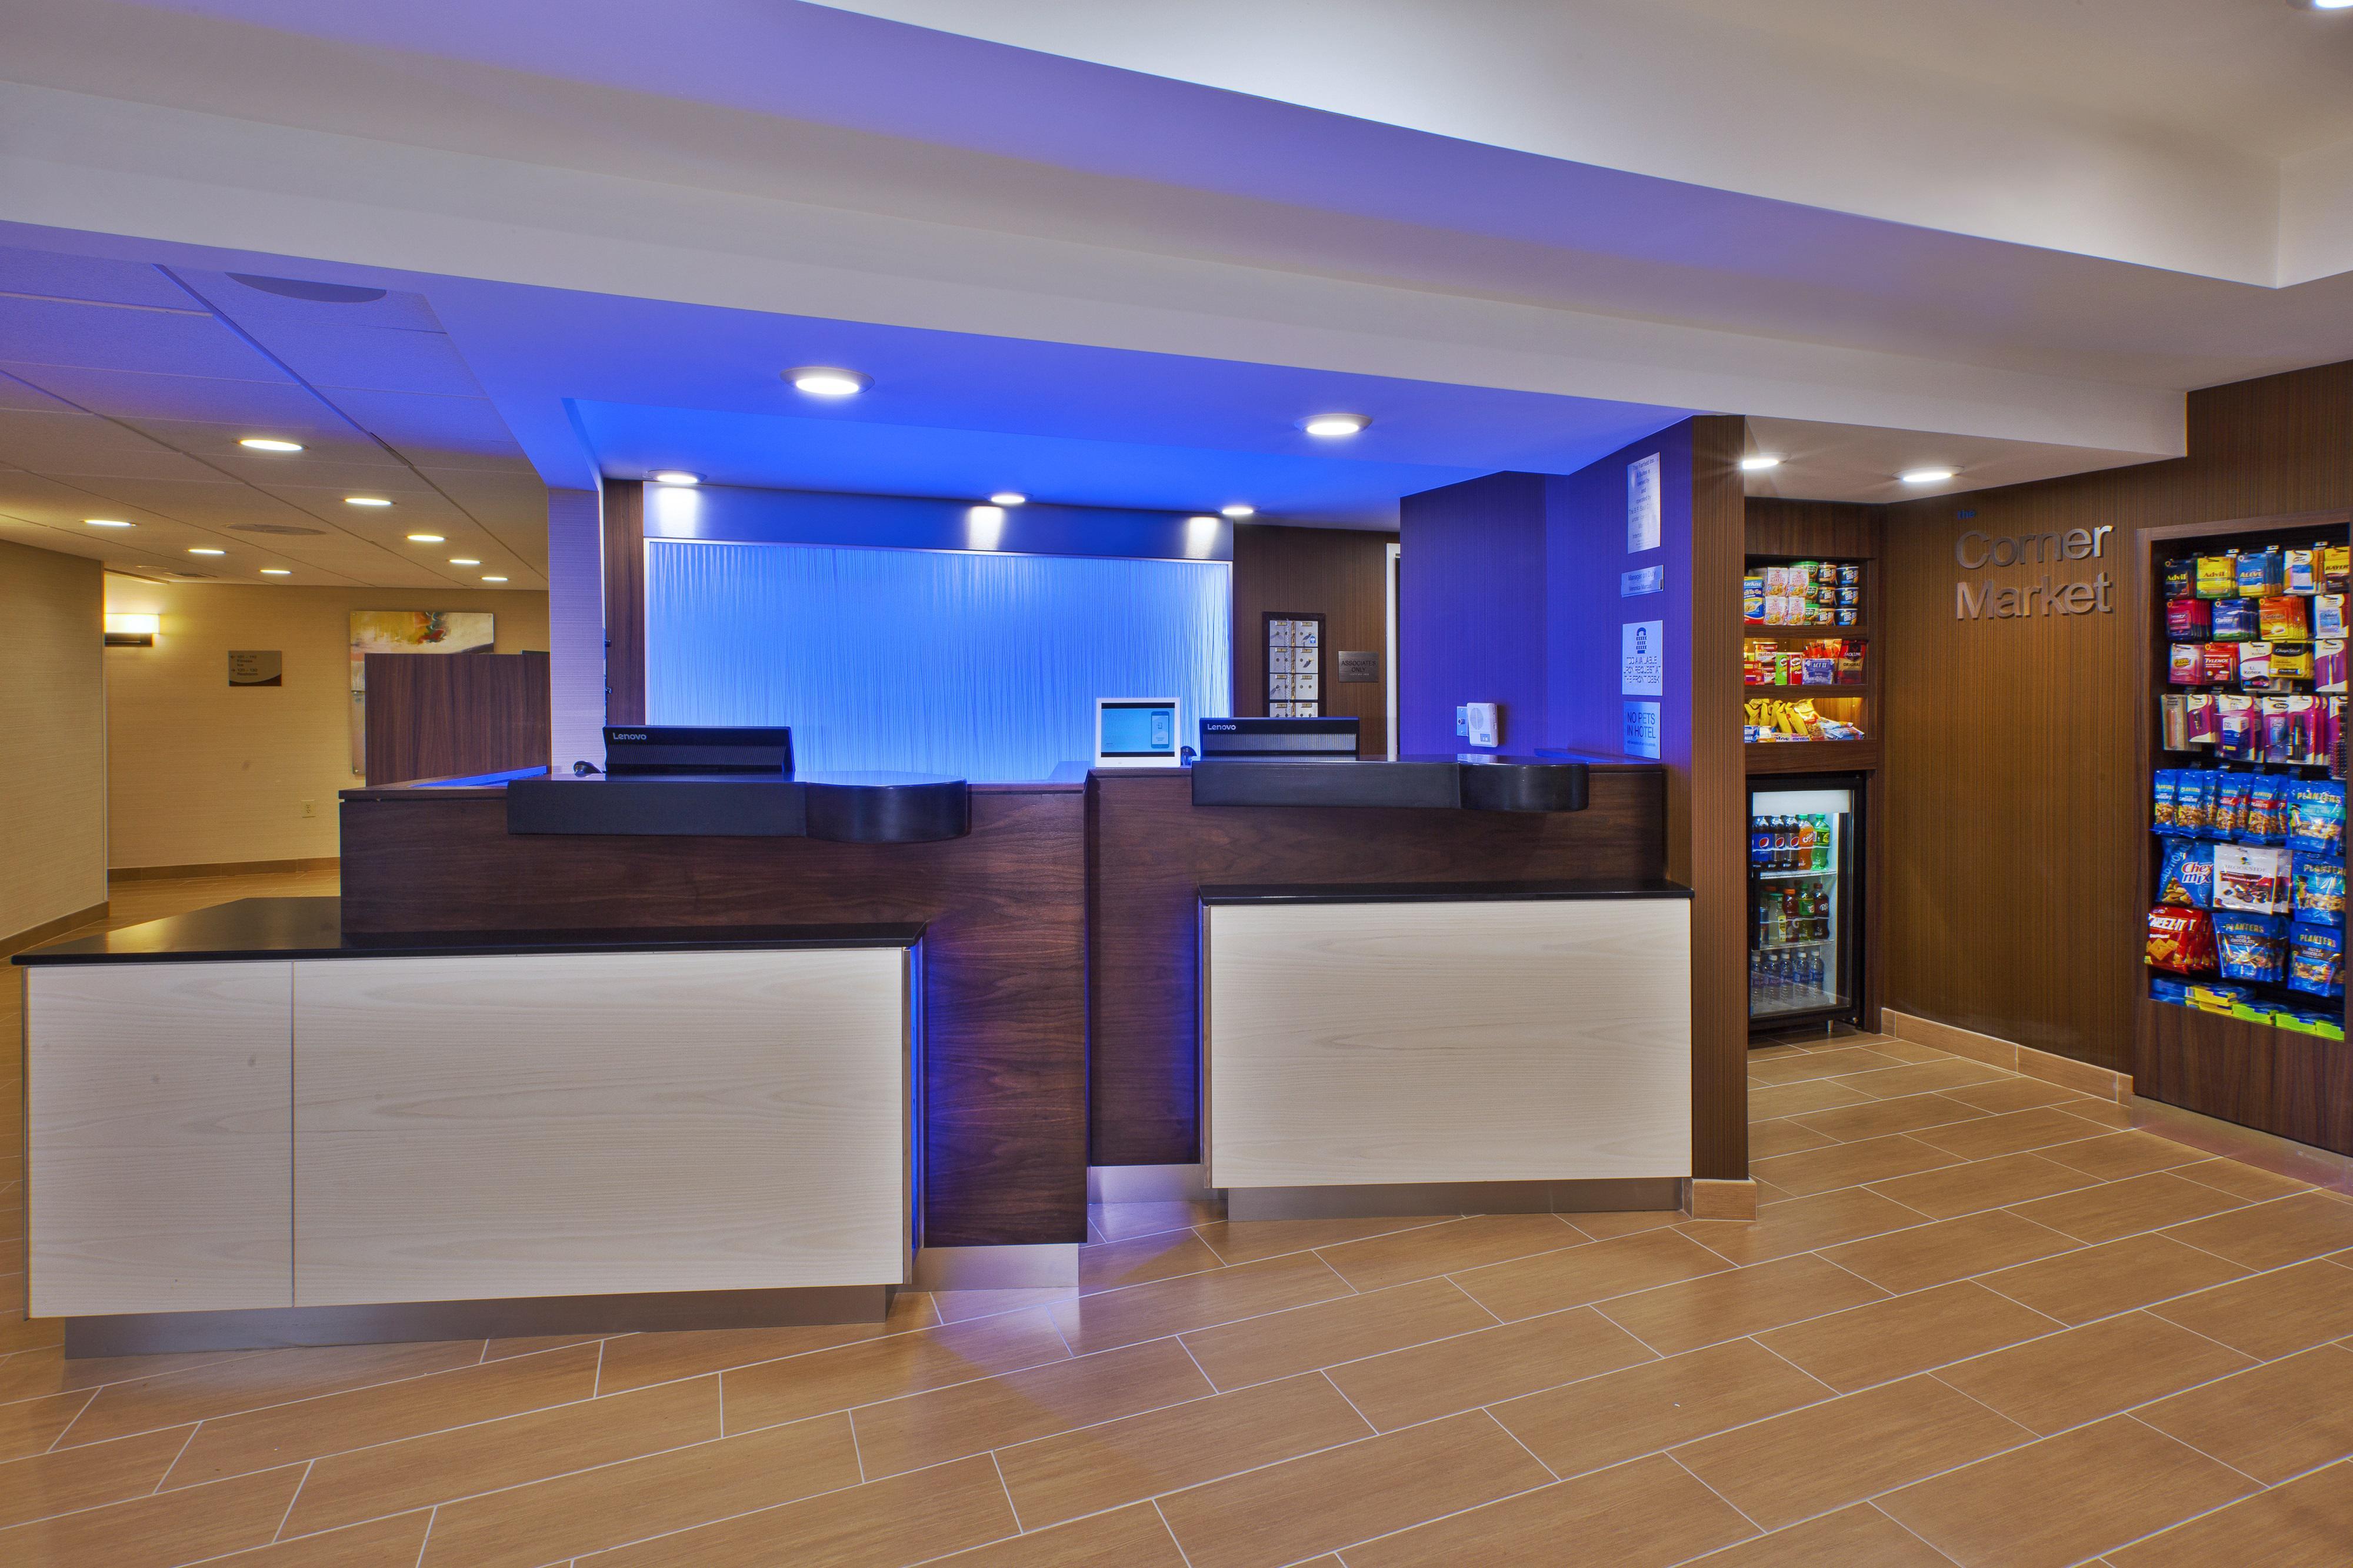 Fairfield Inn & Suites by Marriott Dulles Airport Herndon/Reston image 2